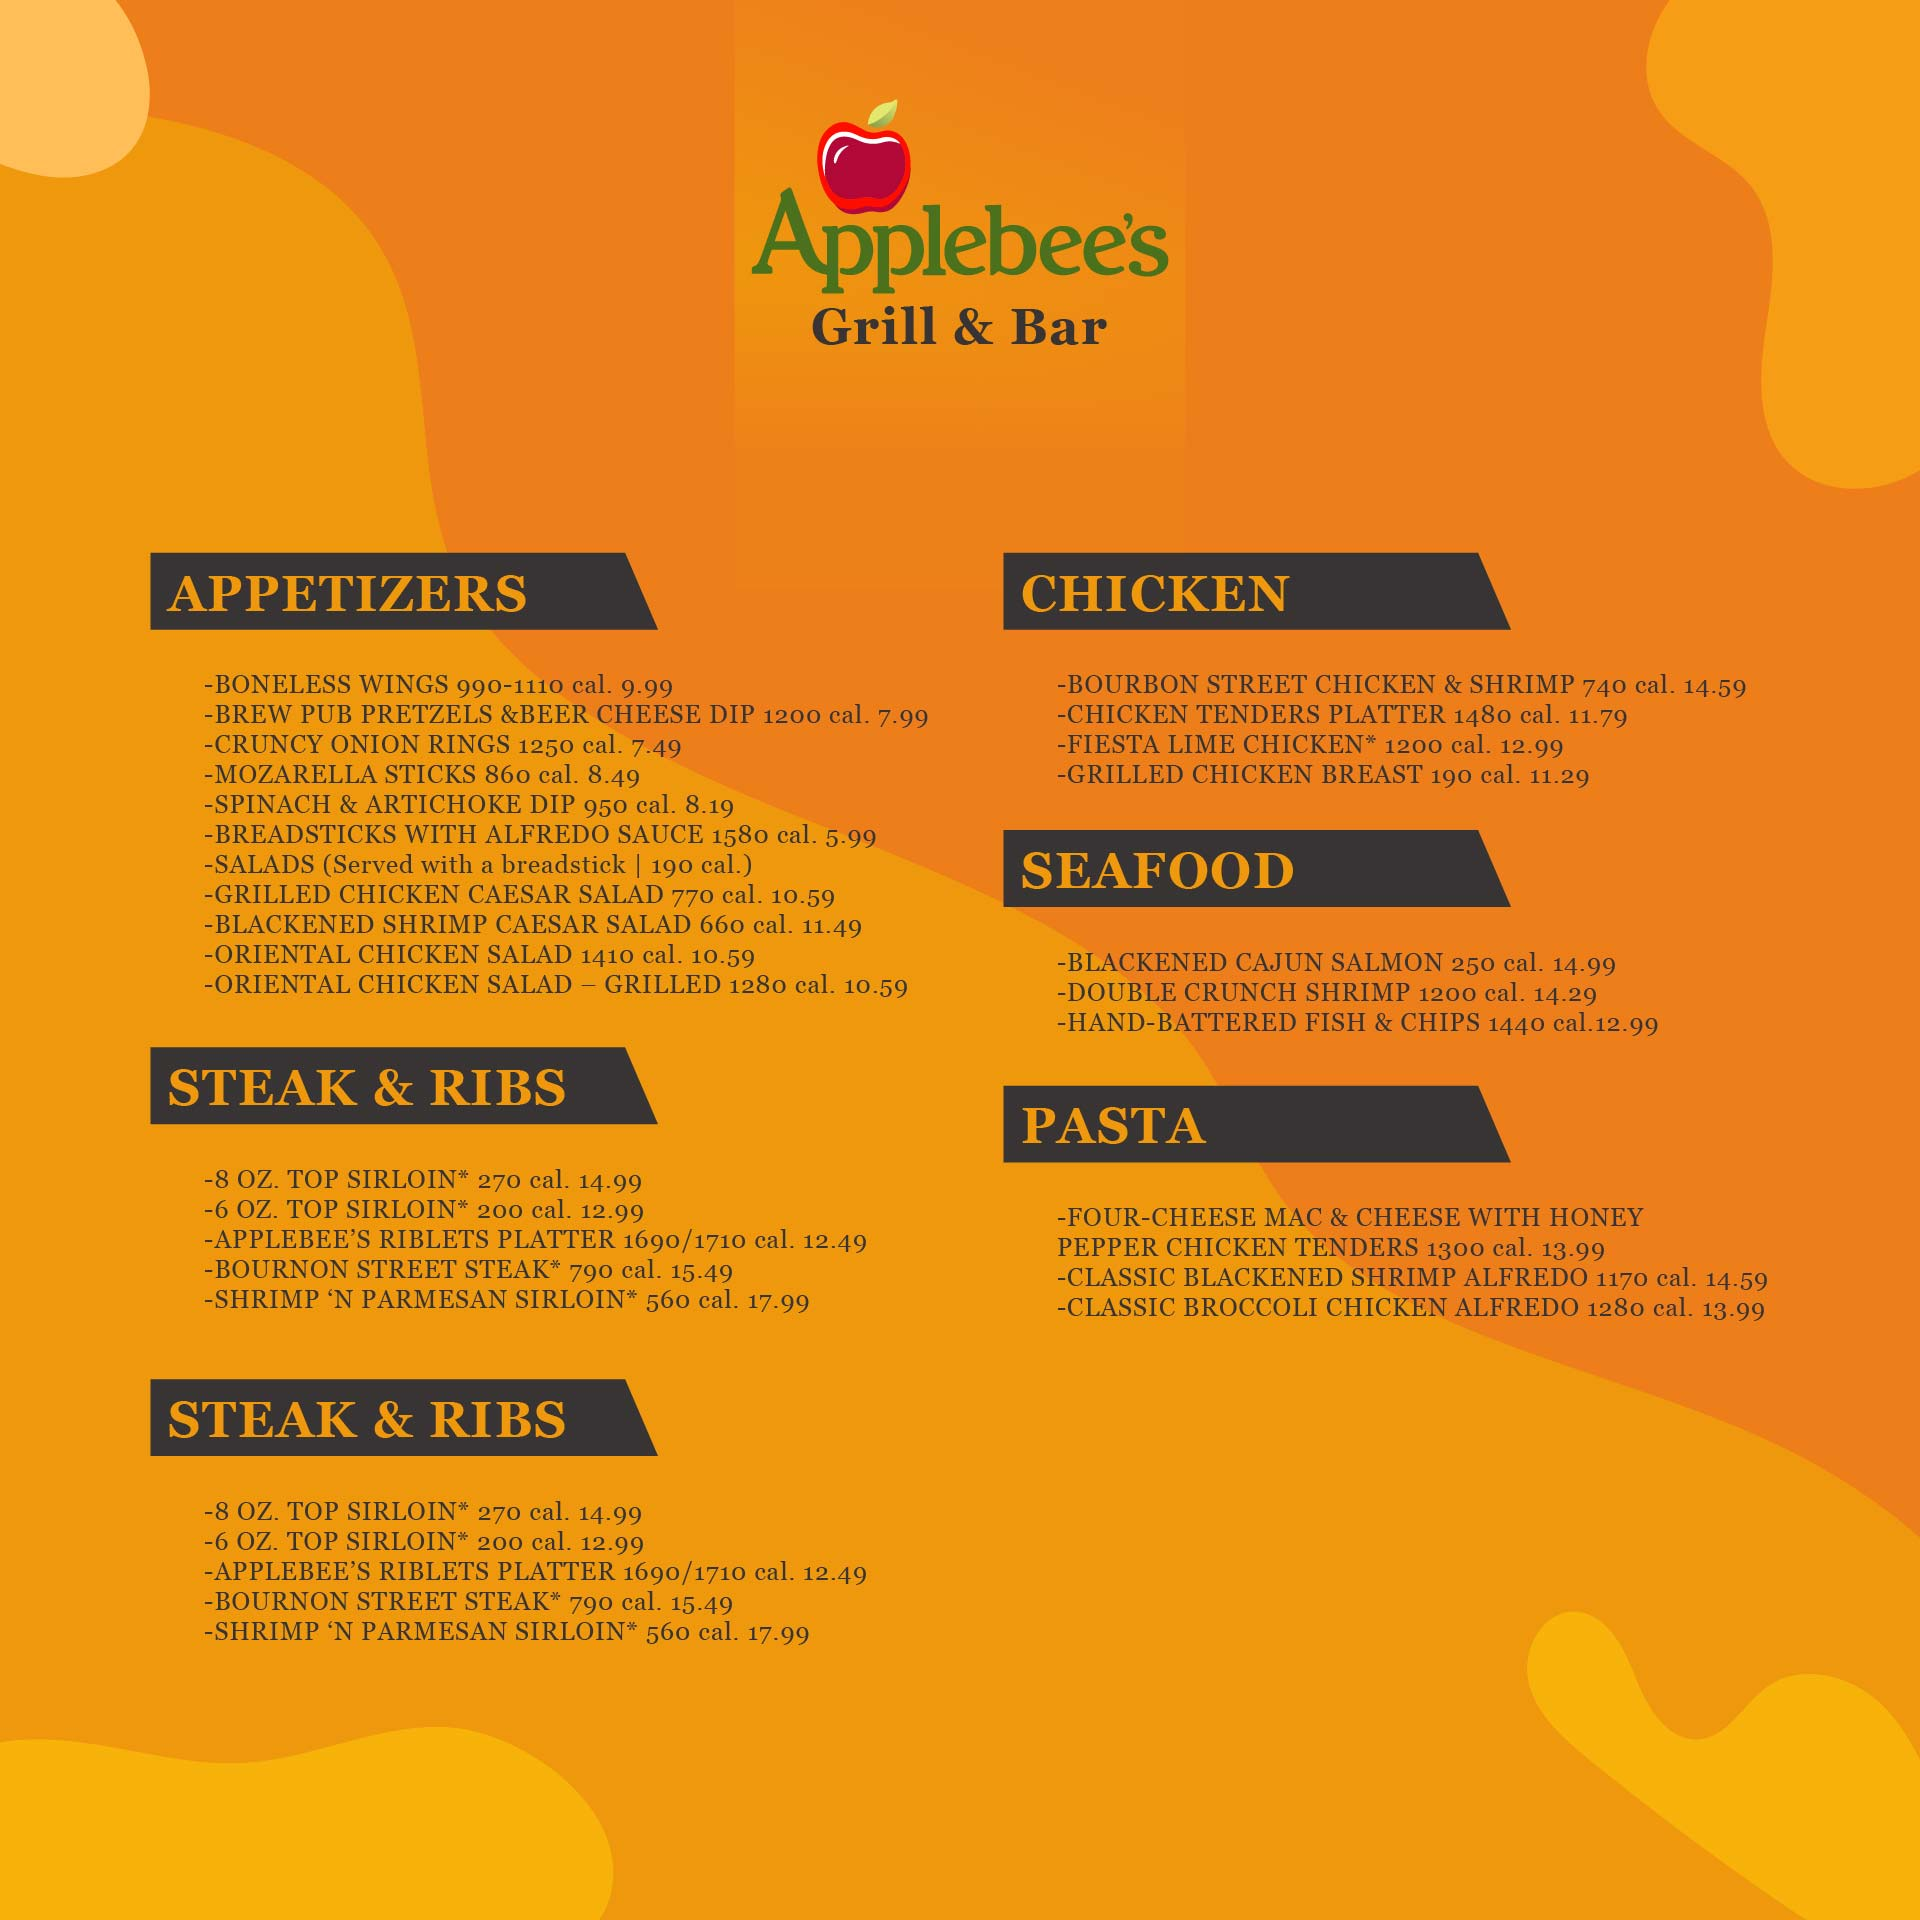 Applebees Menu Printable Version with Prices